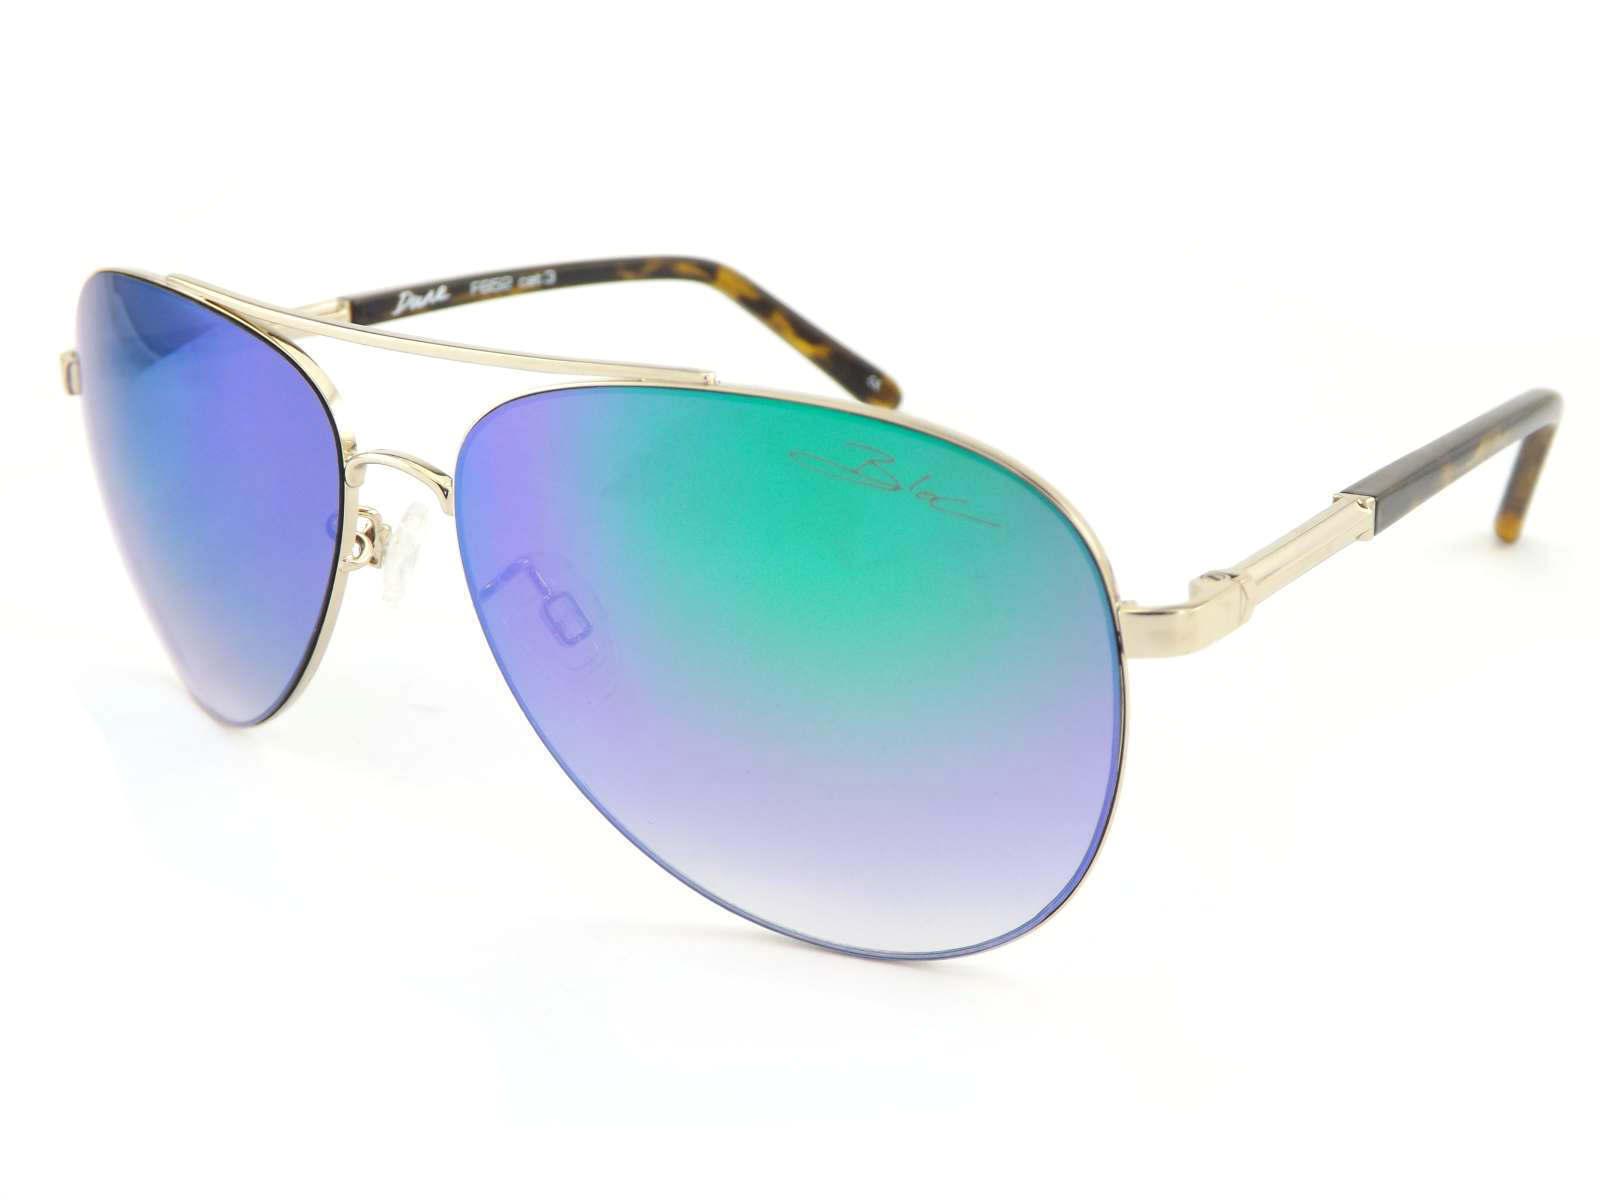 BLOC unisex DUNE metal Sunglasses Light Gold -Tortoise -Tortoise -Tortoise  Grün Mirror Lens F652 | Speichern  89f9d9